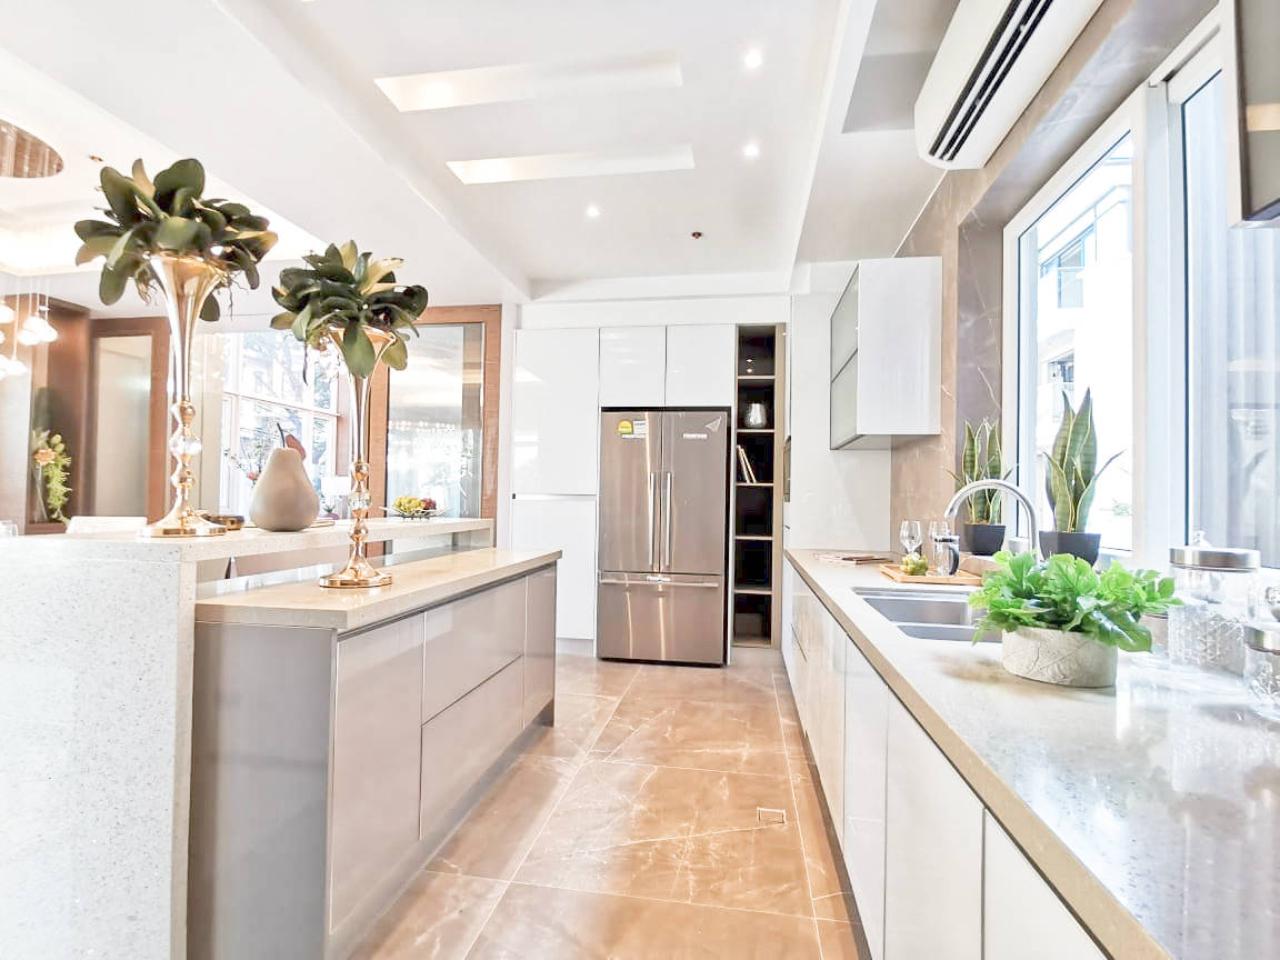 Modern Luxury Architecture With Premium Brand Finishes